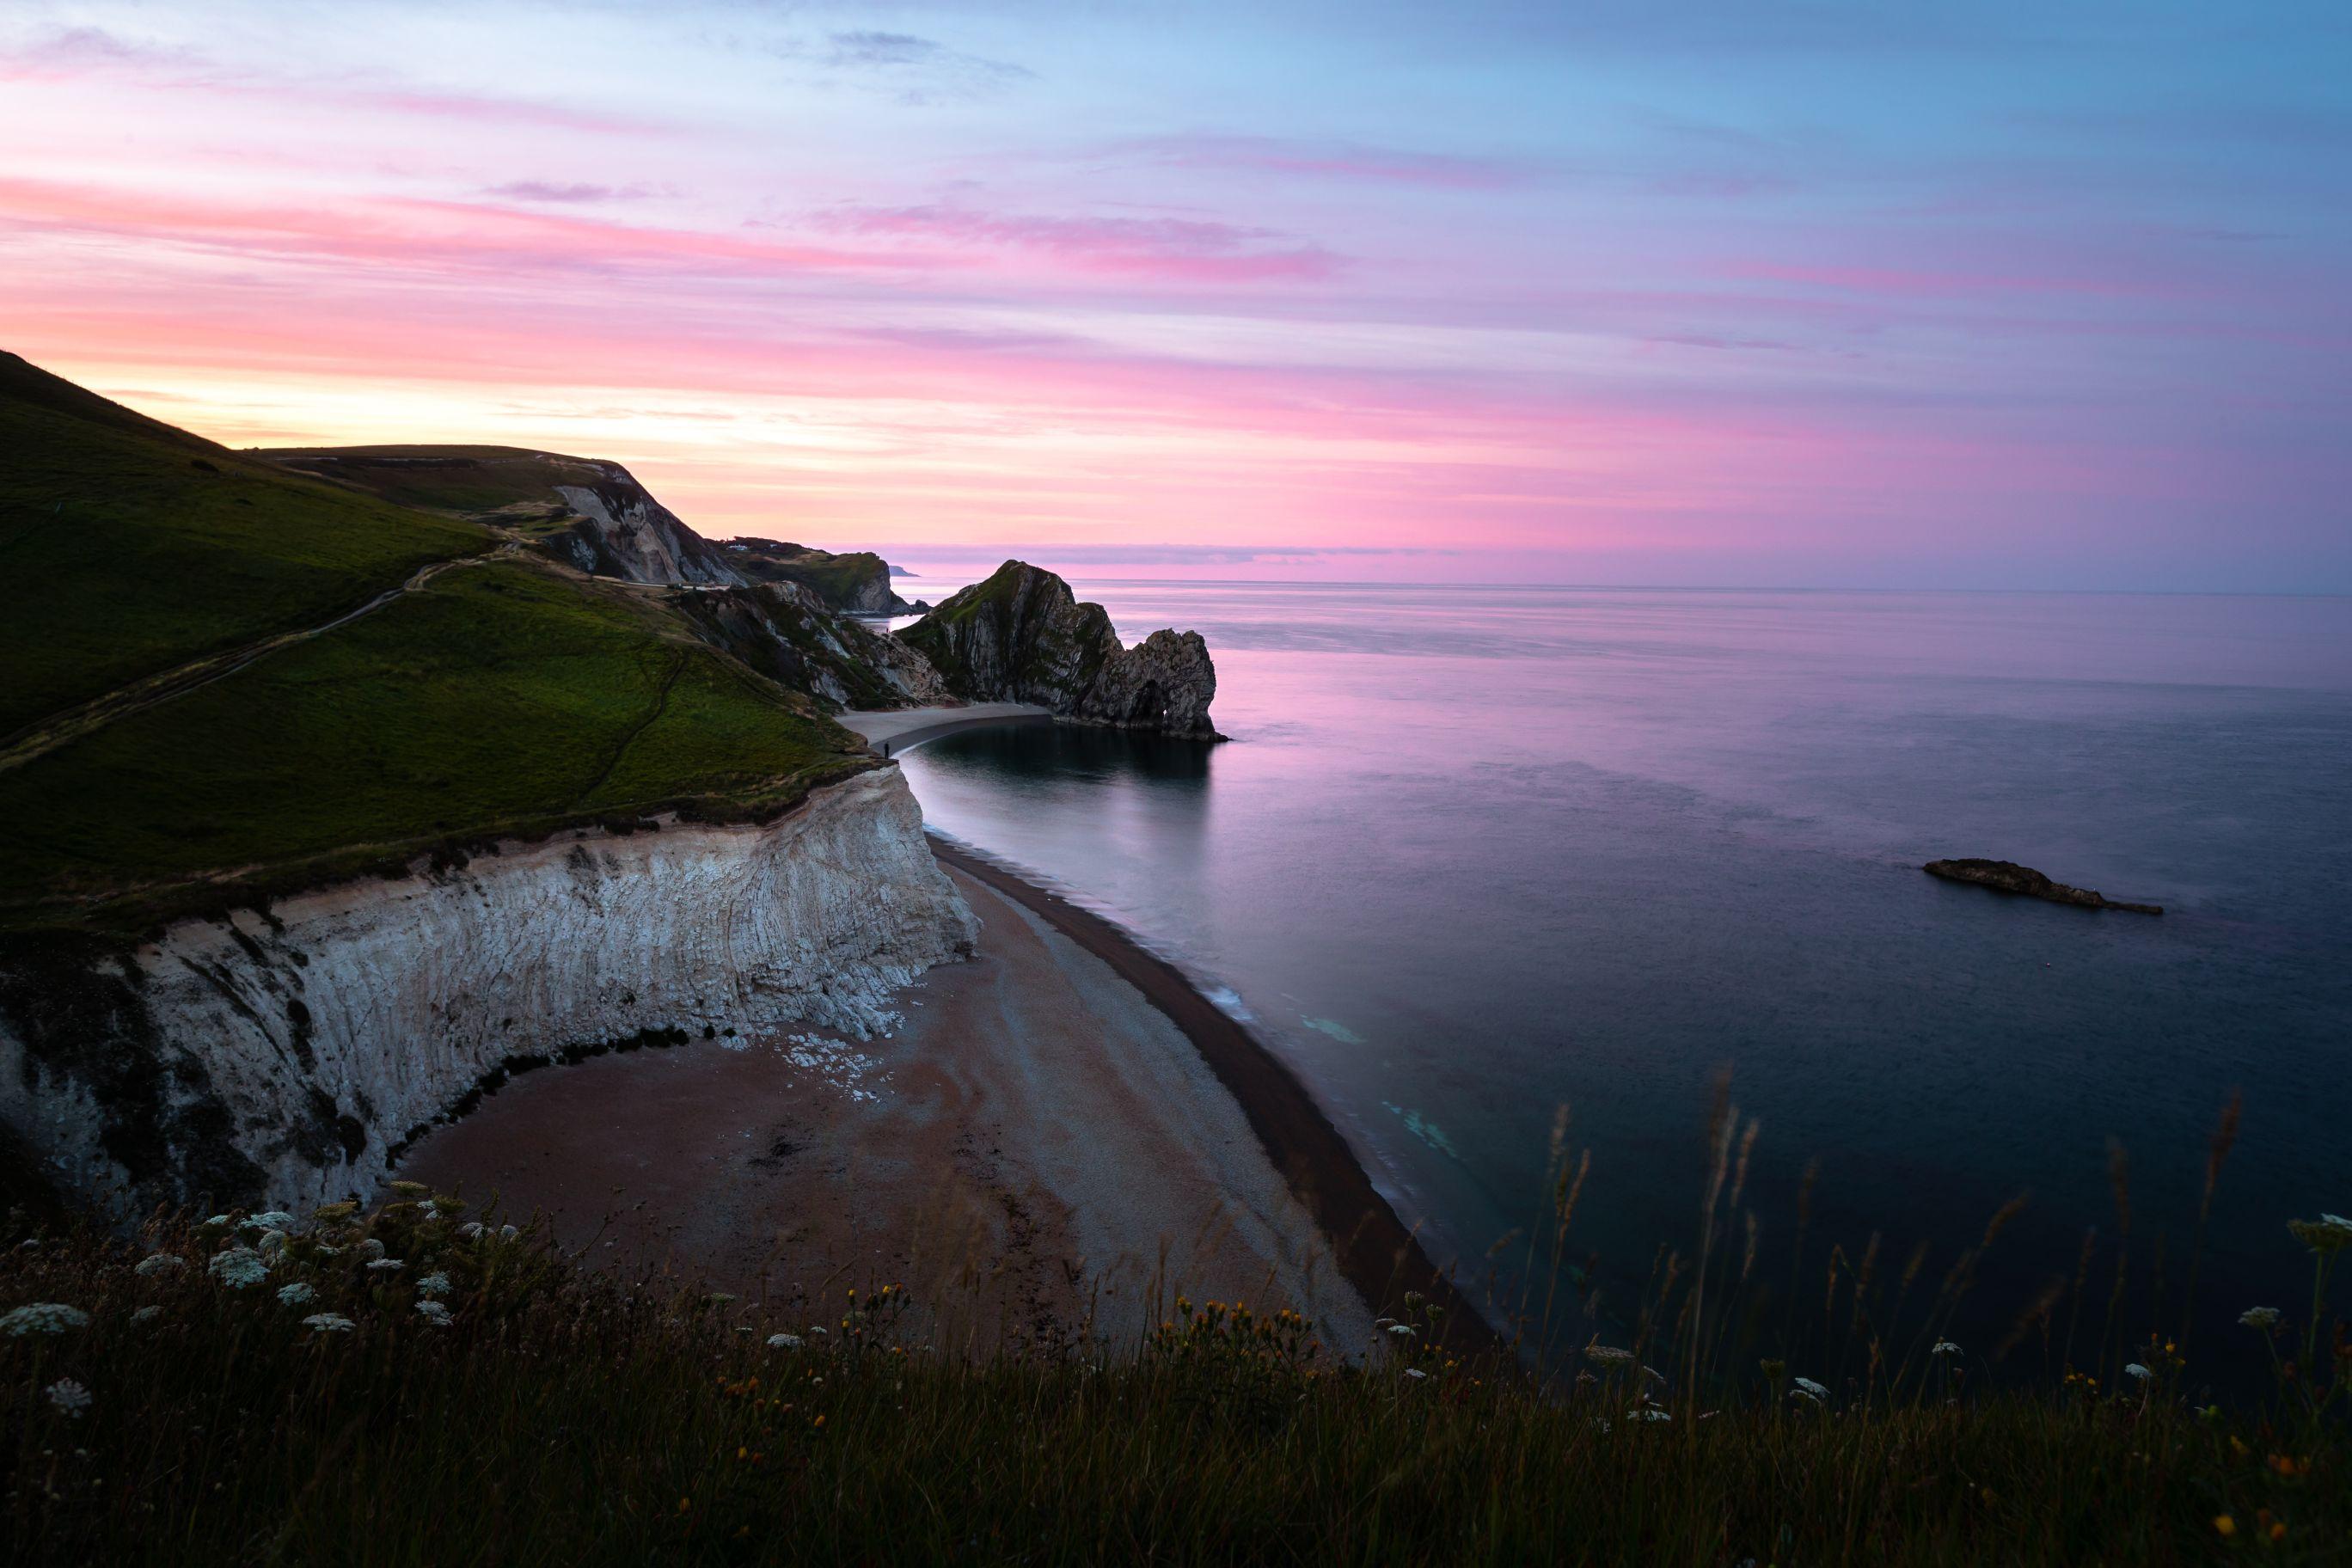 Sunset landscape at the beach.